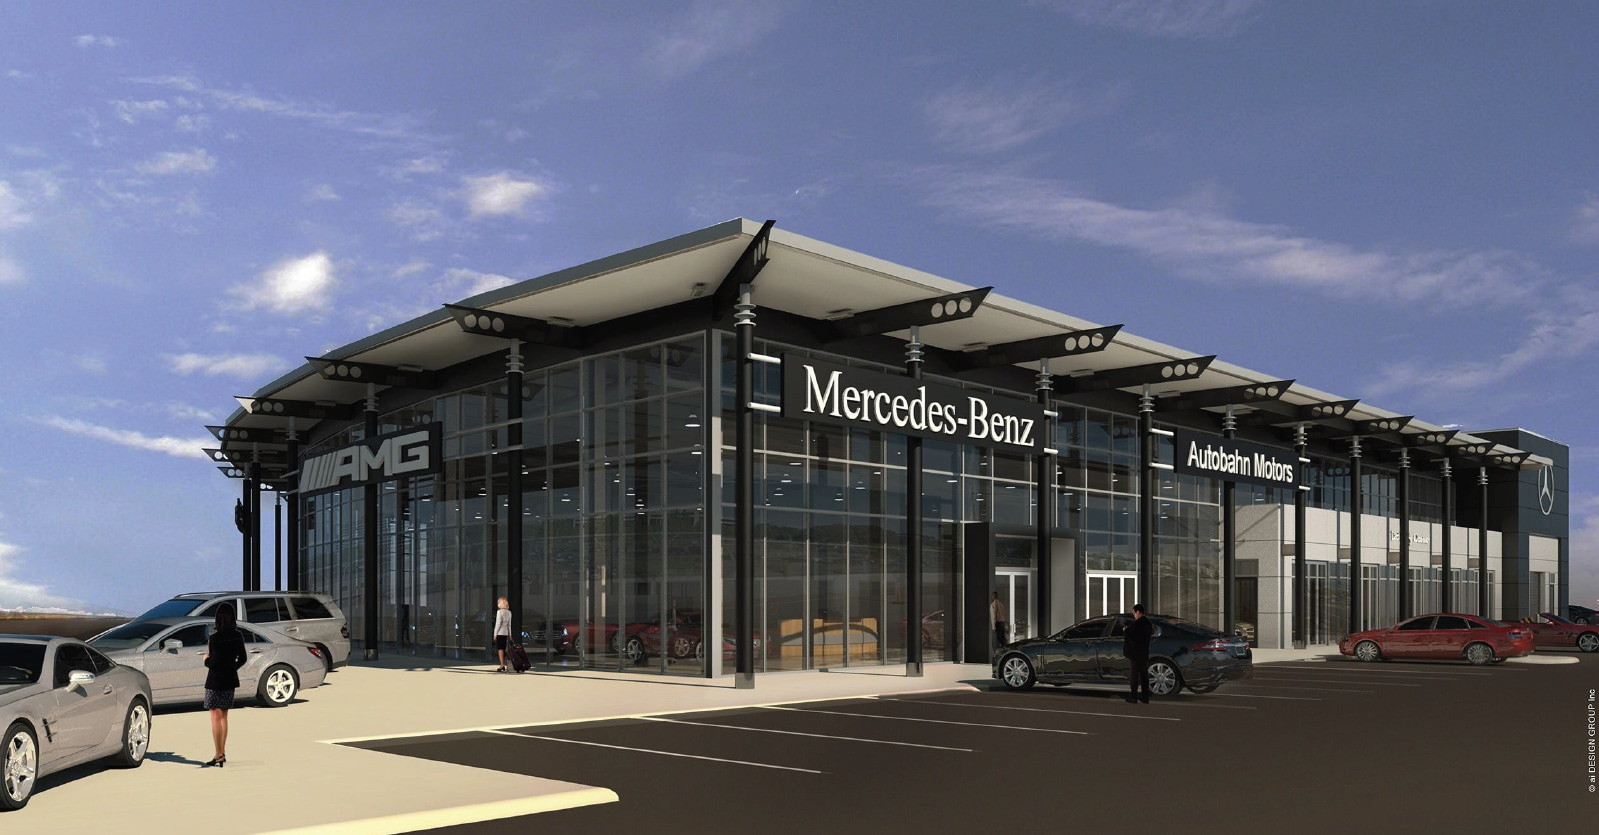 Autobahn motors new mercedes benz dealership in belmont for Mercedes benz dealership belmont